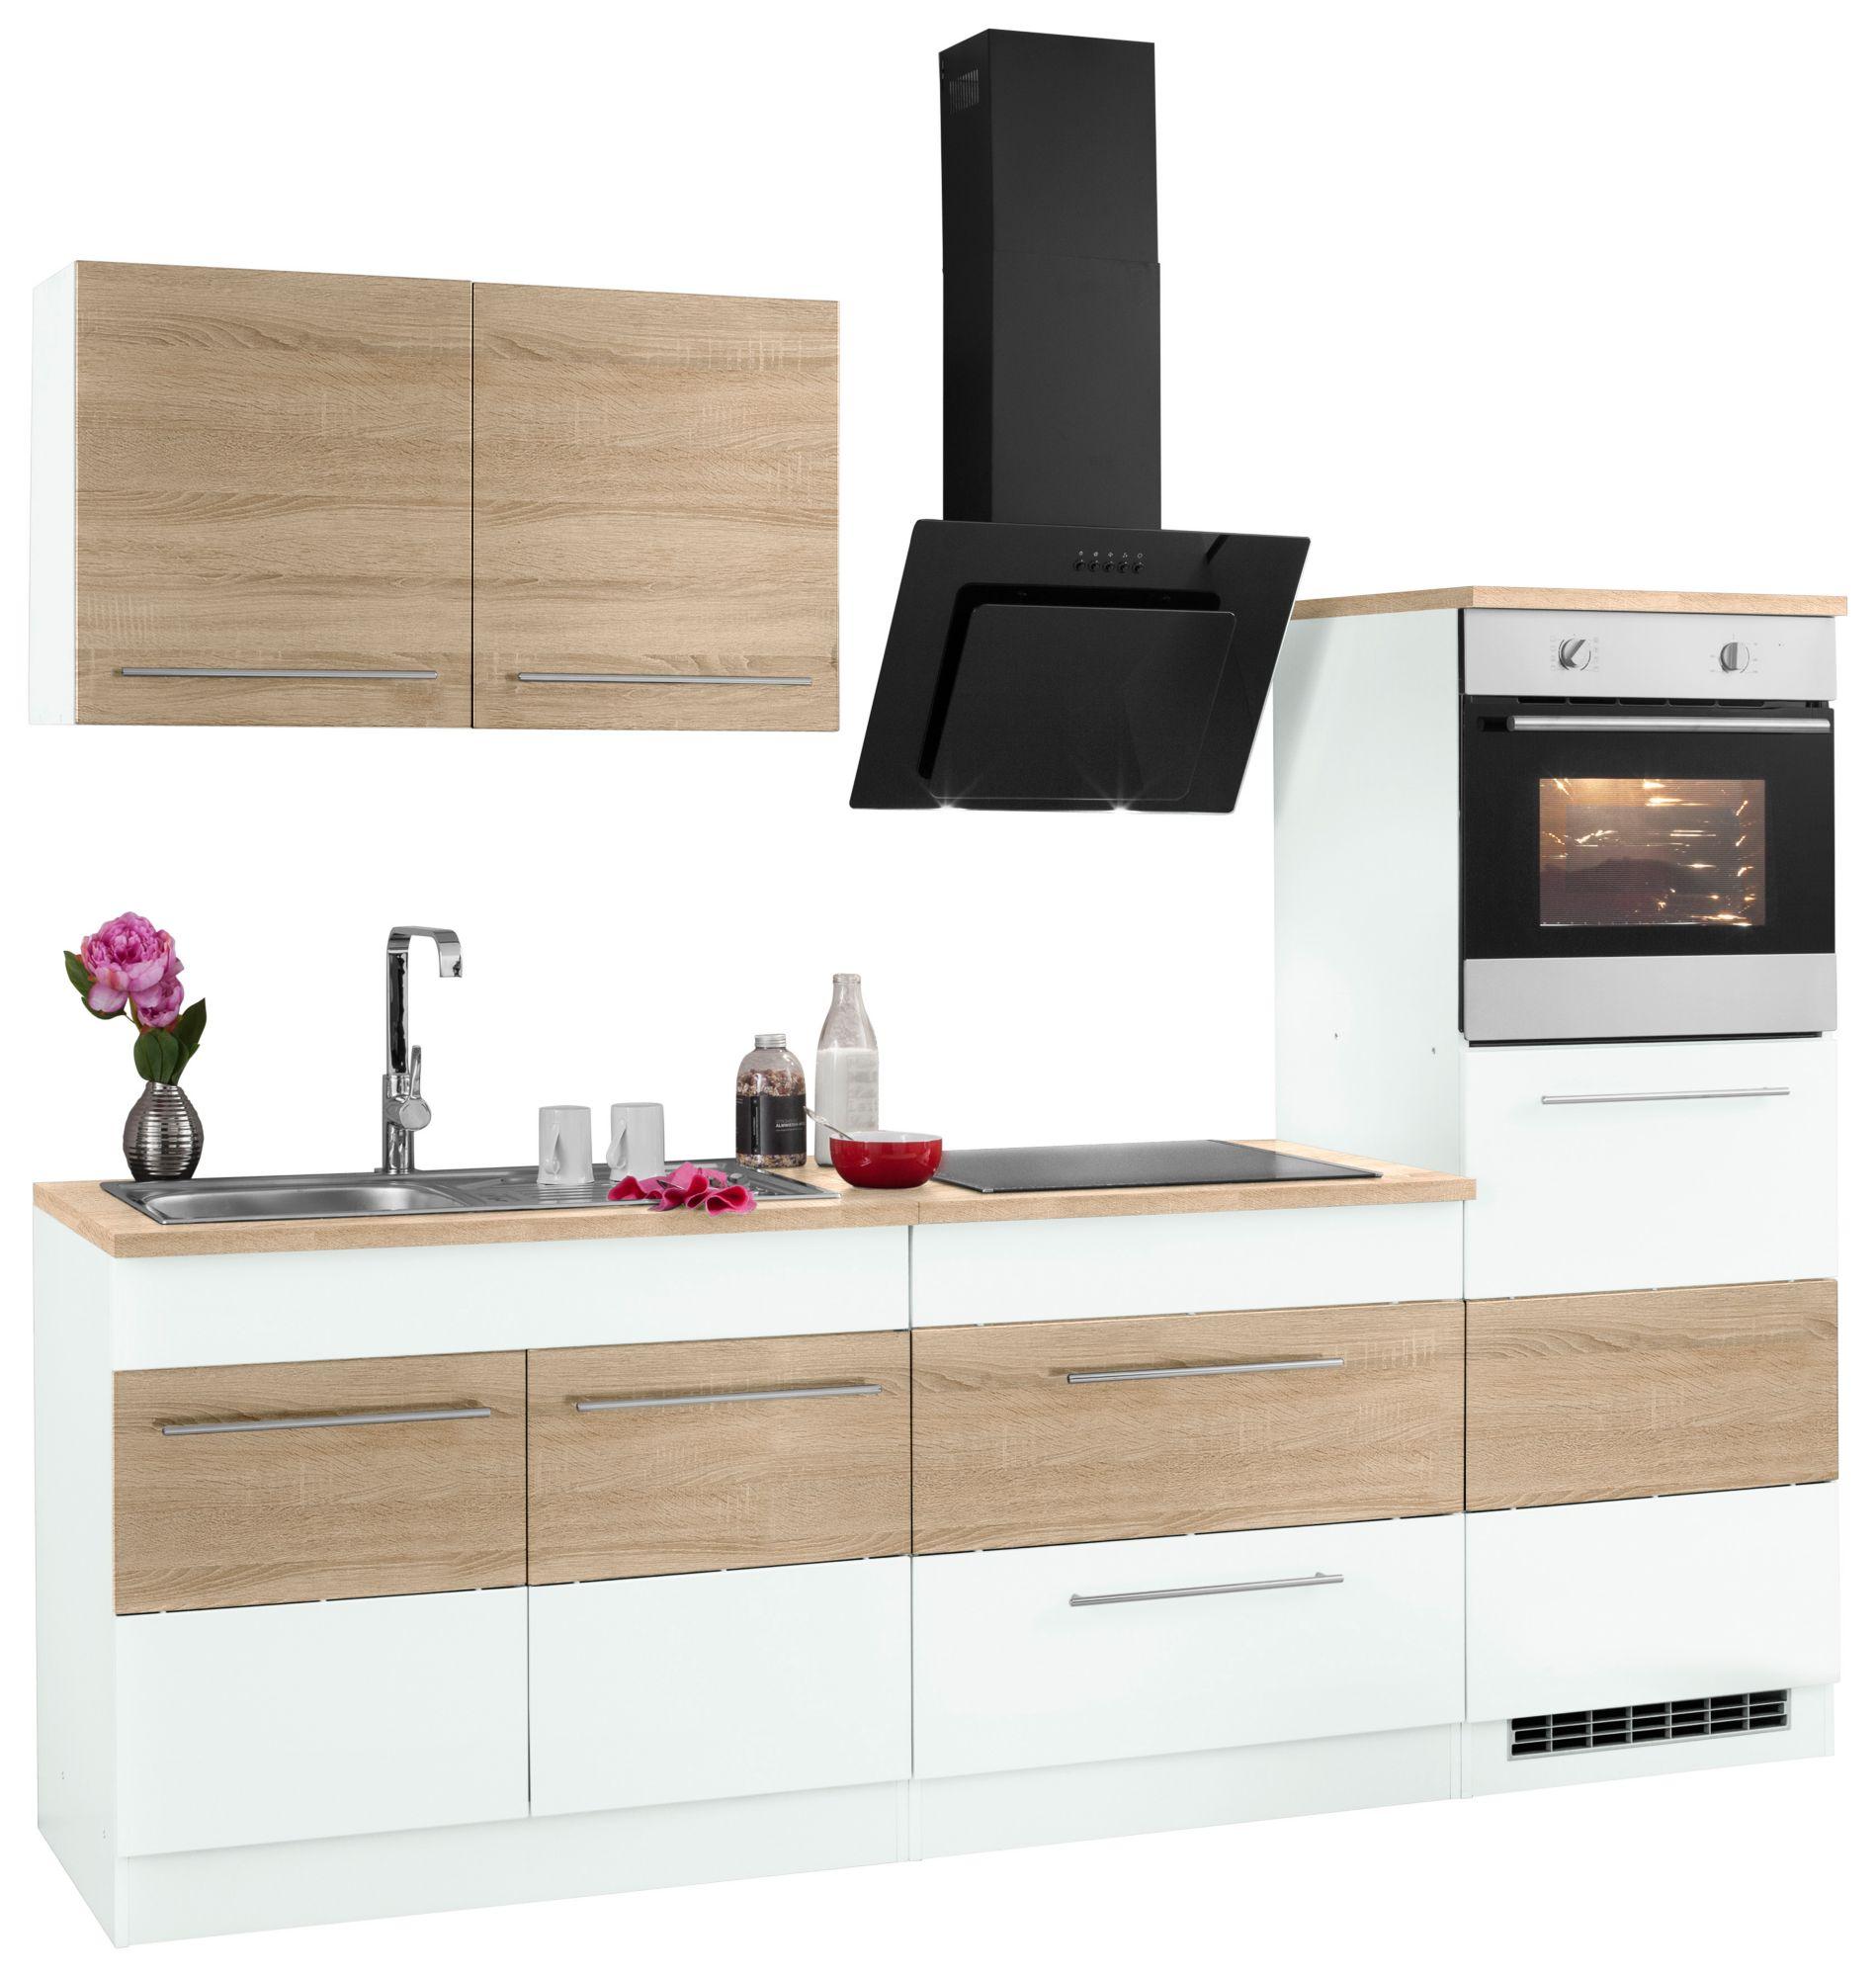 billige kchenzeile mit affordable kuechen billig trekt billig kchenzeile with billige. Black Bedroom Furniture Sets. Home Design Ideas